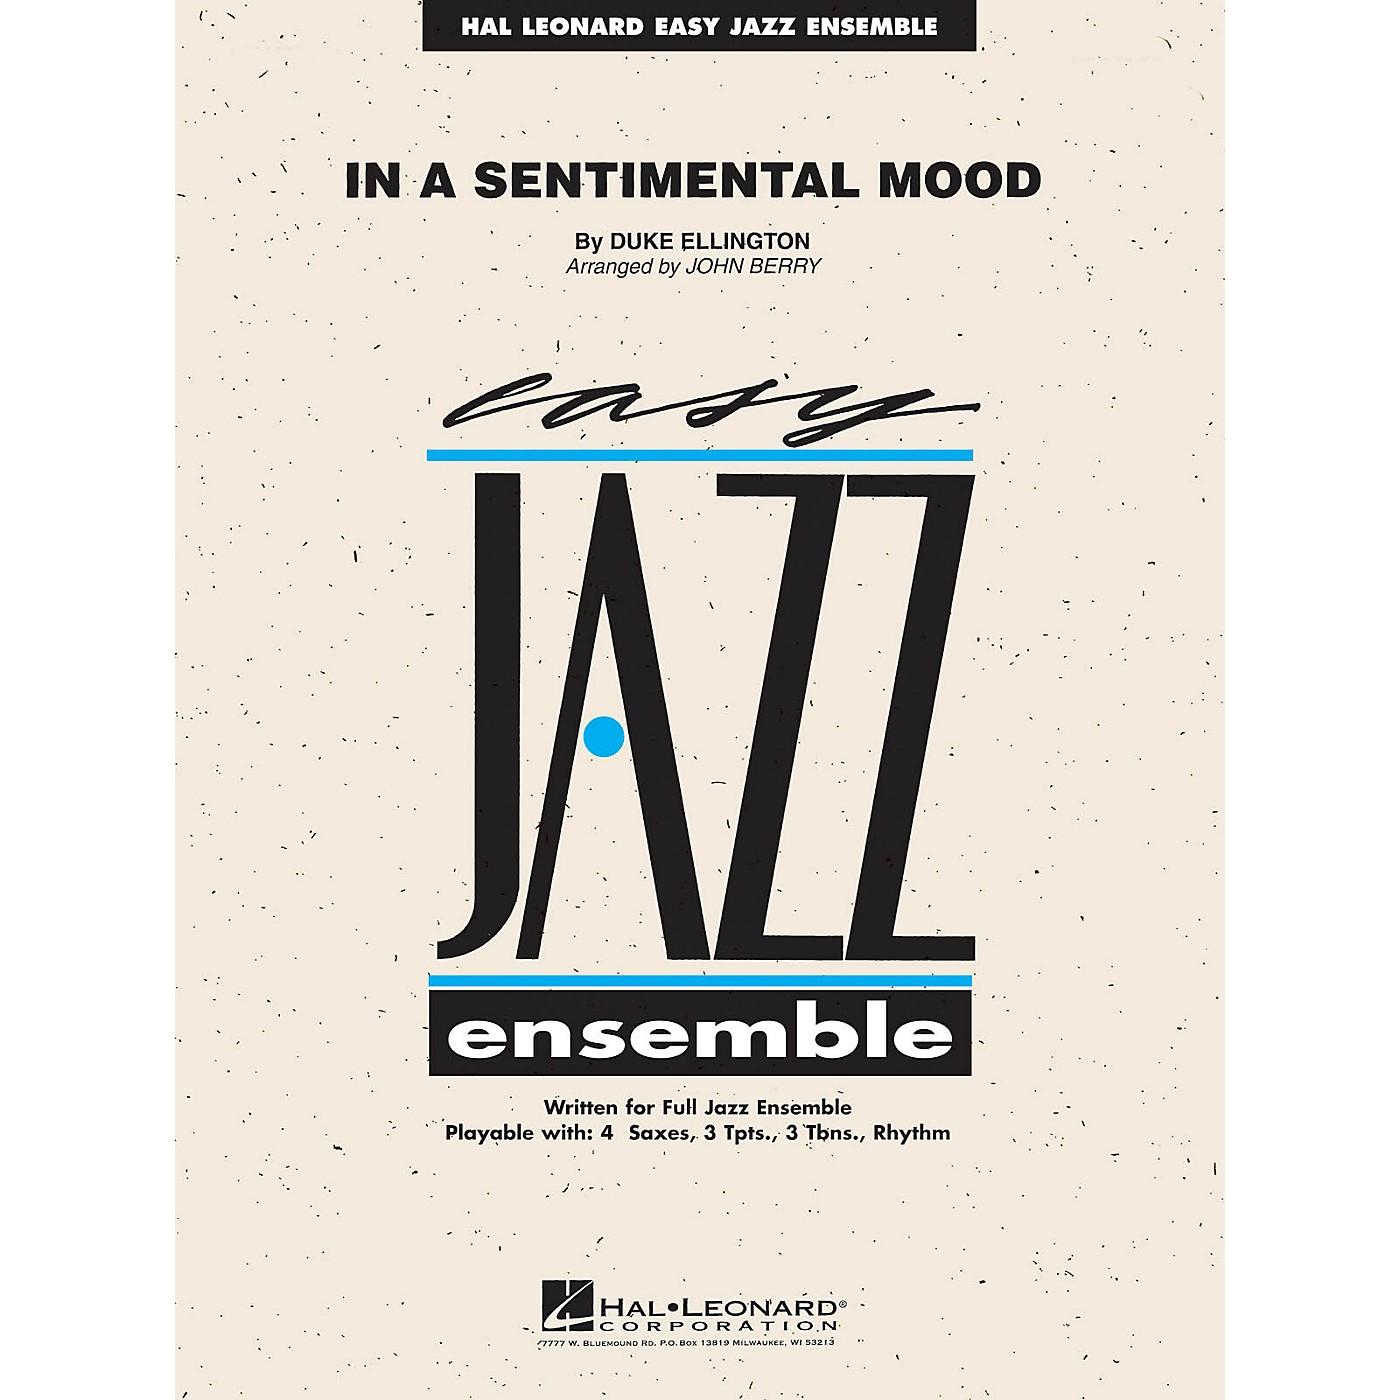 Hal Leonard In a Sentimental Mood Jazz Band Level 2 Arranged by John Berry thumbnail